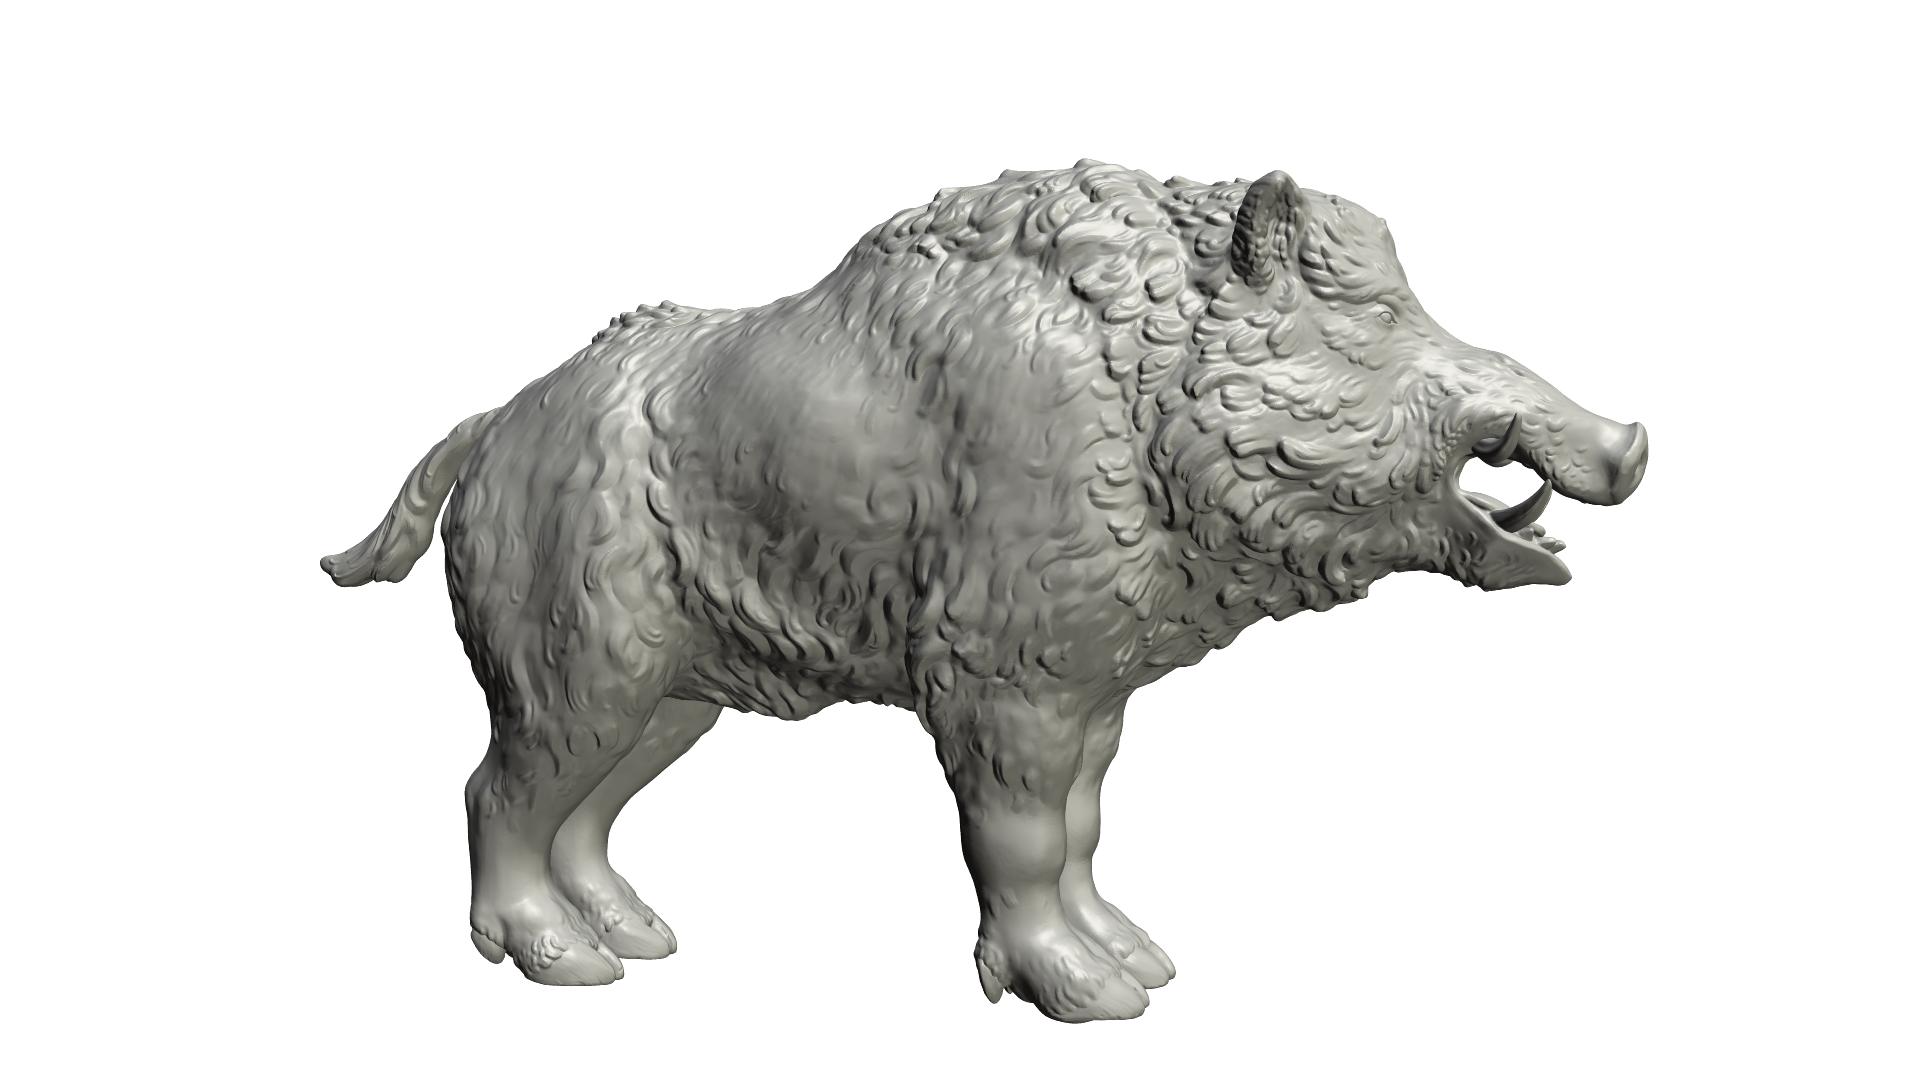 signature.png Download STL file Boar • 3D printable design, Skazok